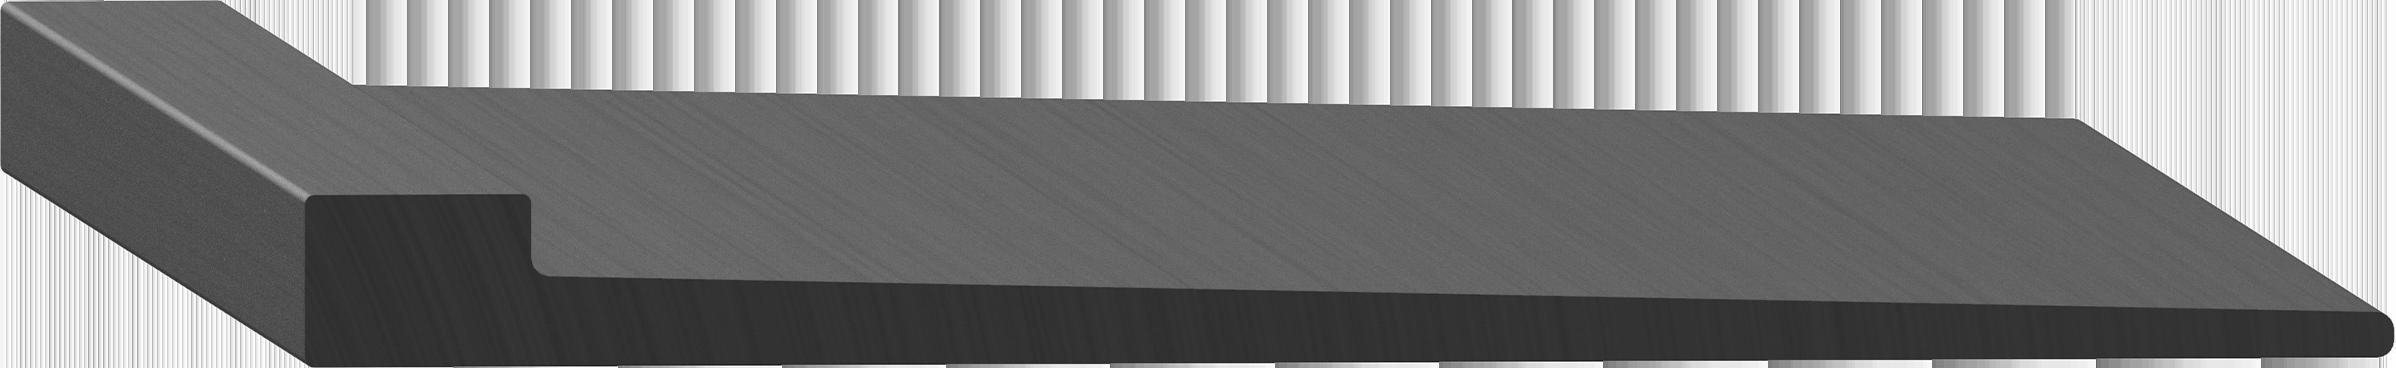 Uni-Grip part: DD-014